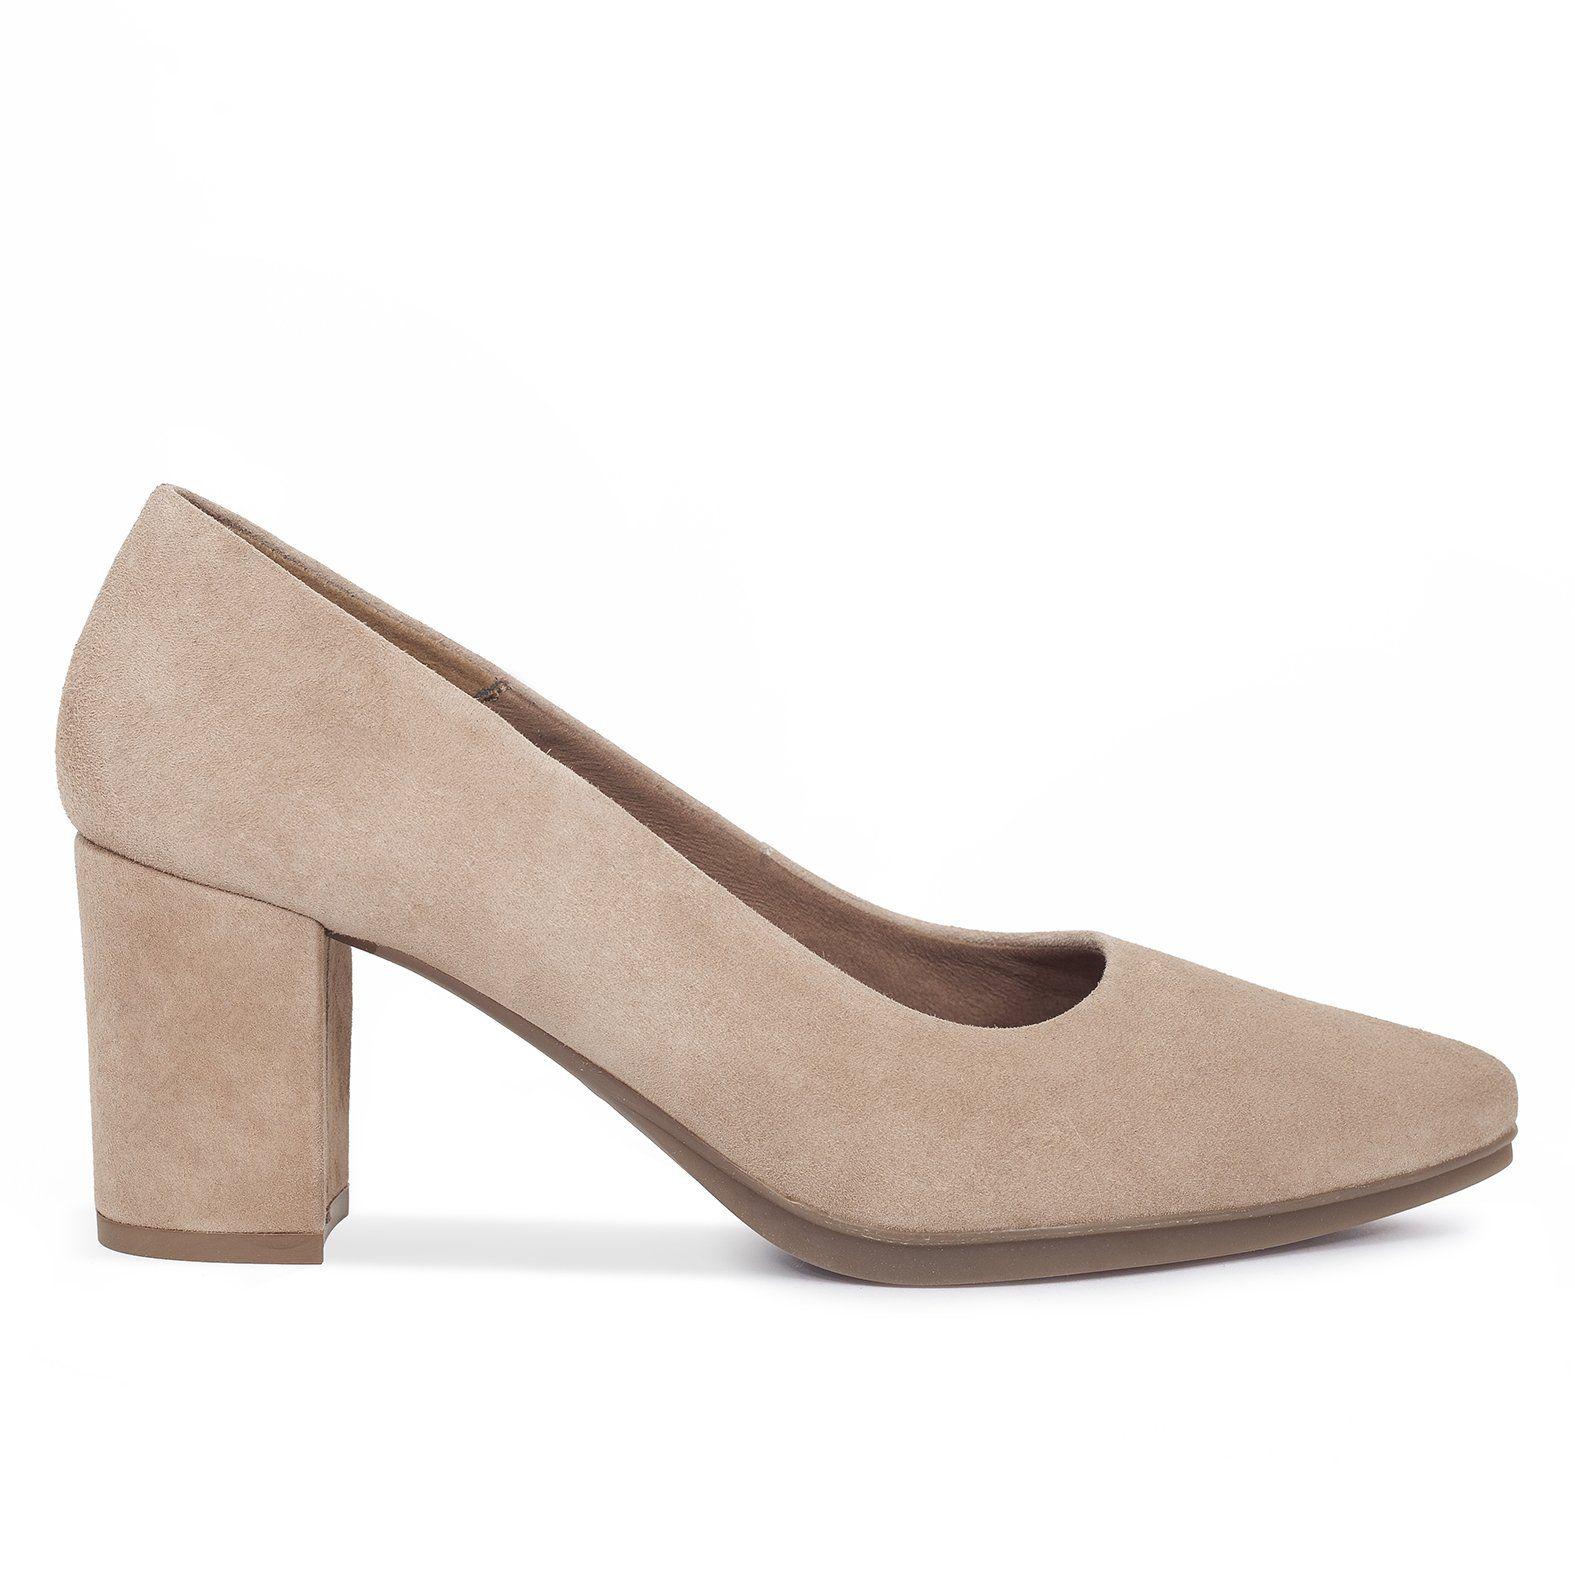 72928e23 Zapatos mujer tacón ancho ROSA NUDE Urban S - Zapatos online miMaO – miMaO  ShopOnline